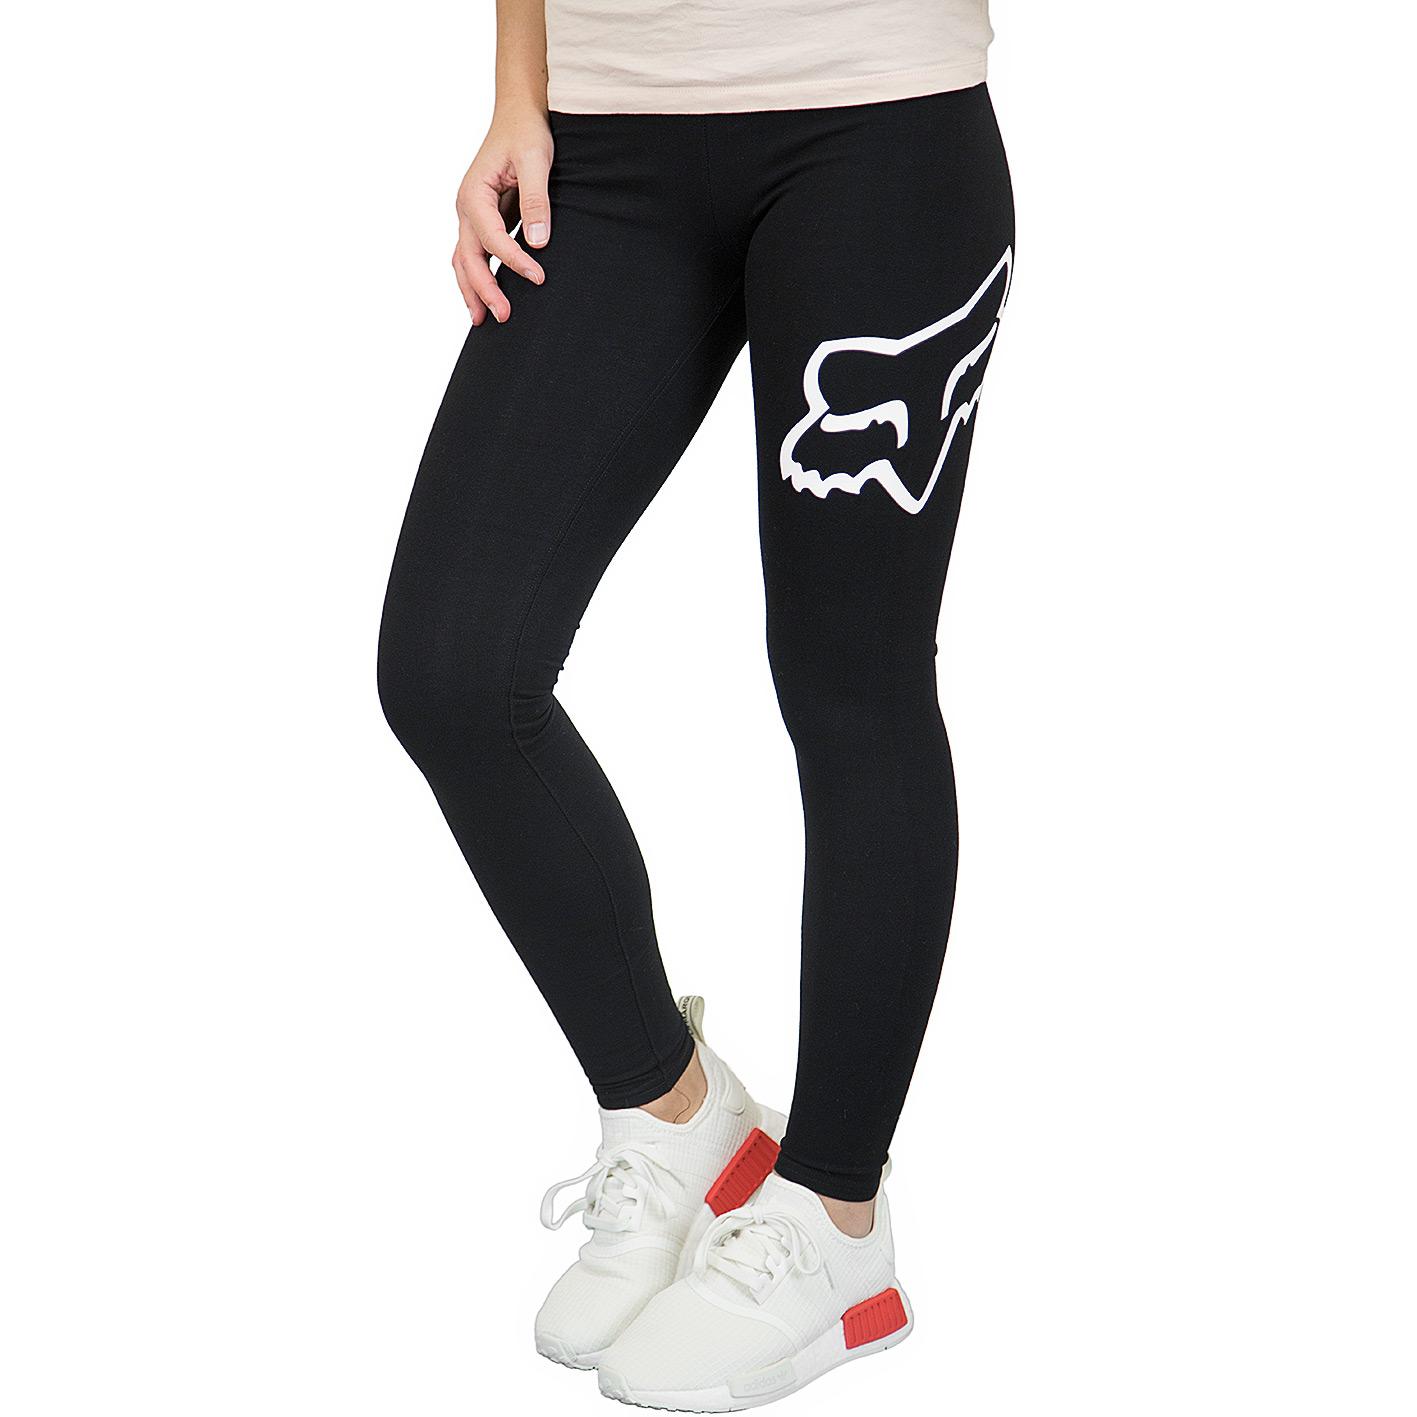 fox leggings enduration schwarz wei hier bestellen. Black Bedroom Furniture Sets. Home Design Ideas